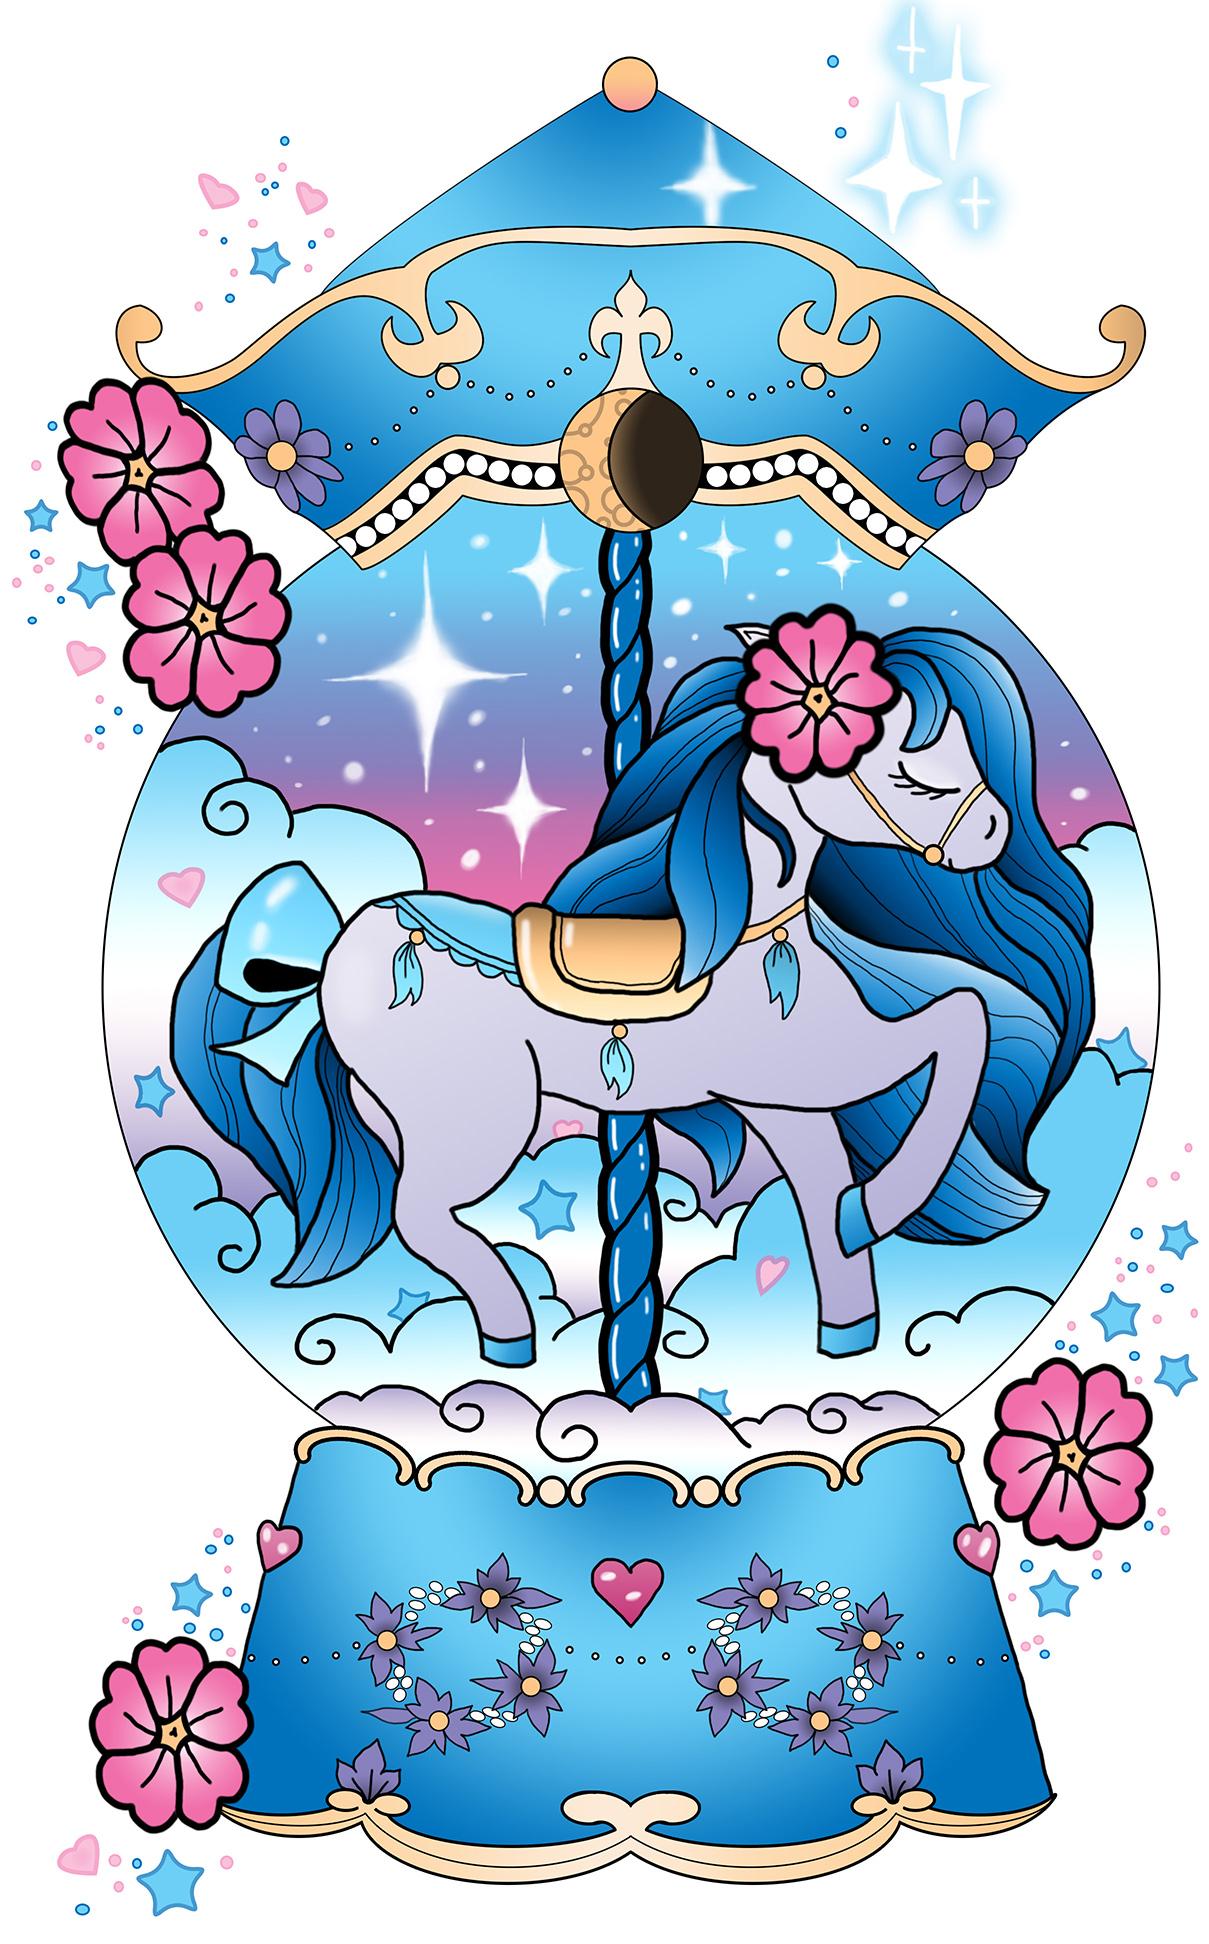 Carousel Pony Tattoo Illustration